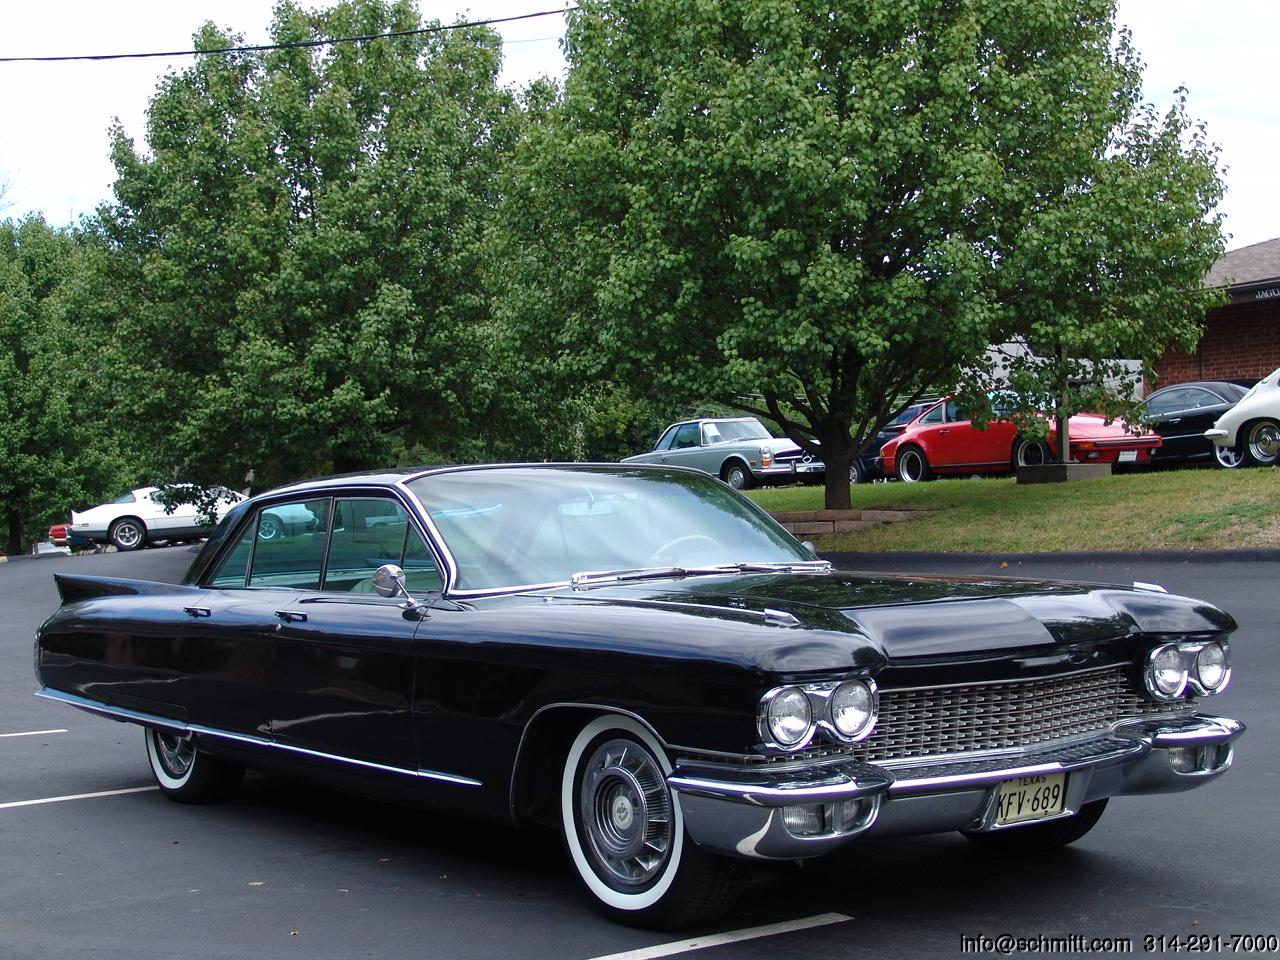 HQ 1959 Cadillac Eldorado Brougham Wallpapers | File 271.72Kb